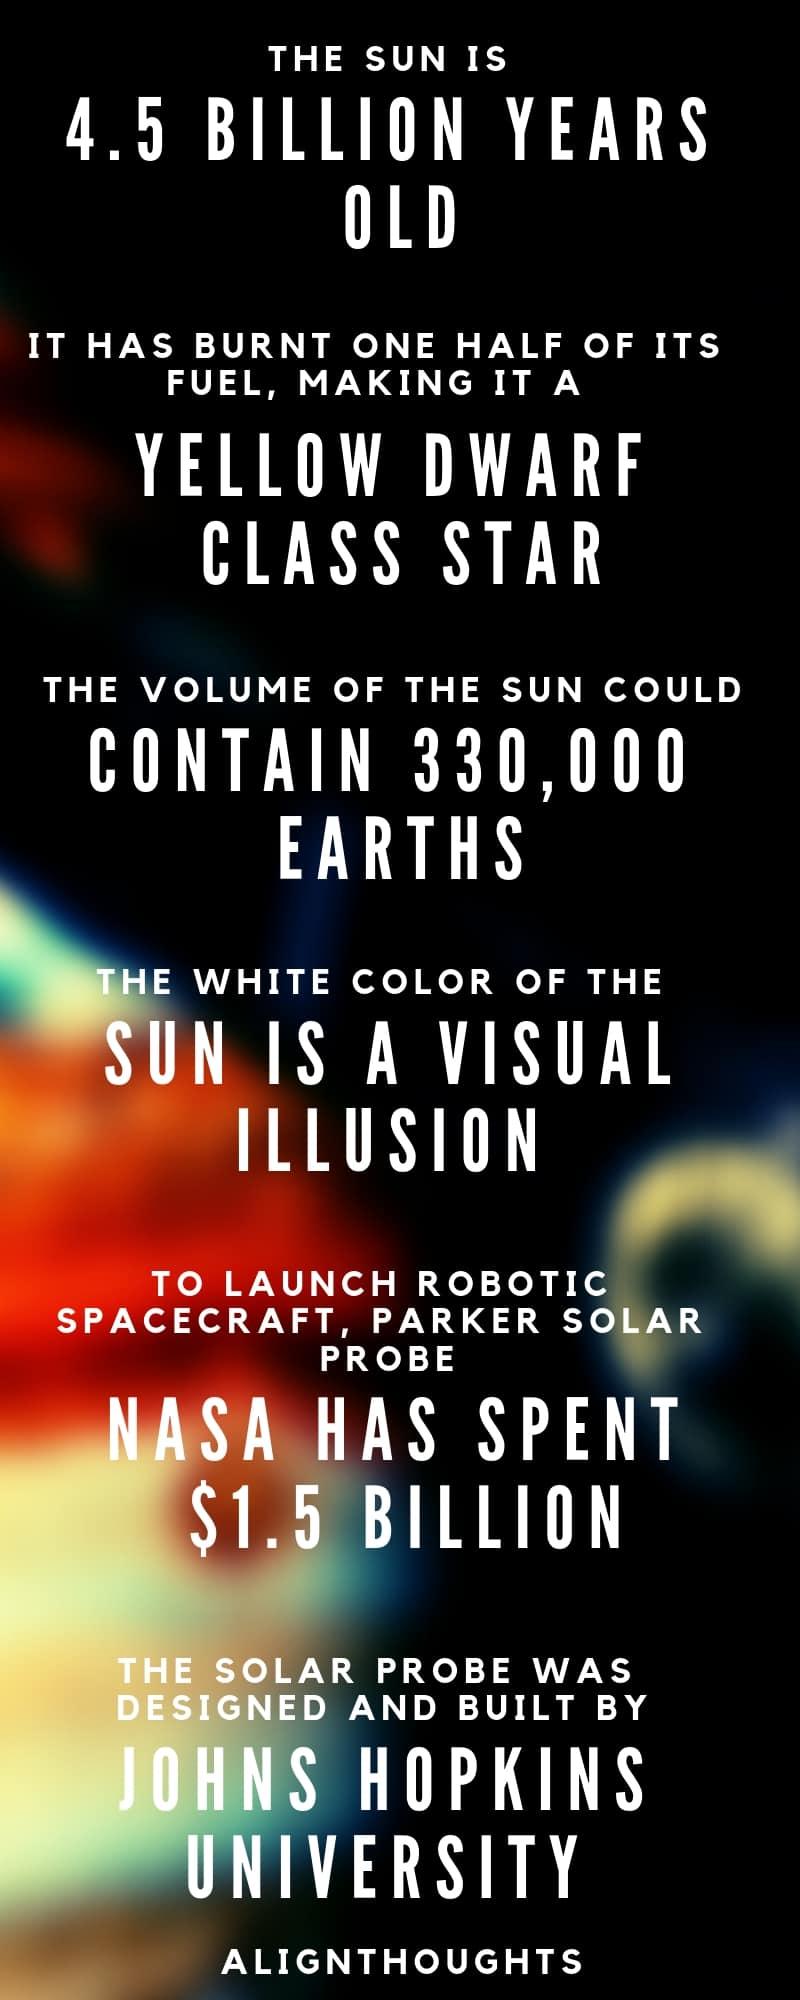 the-parker-solar-probe-nasas-robotic-spacecraft-alignthoughts